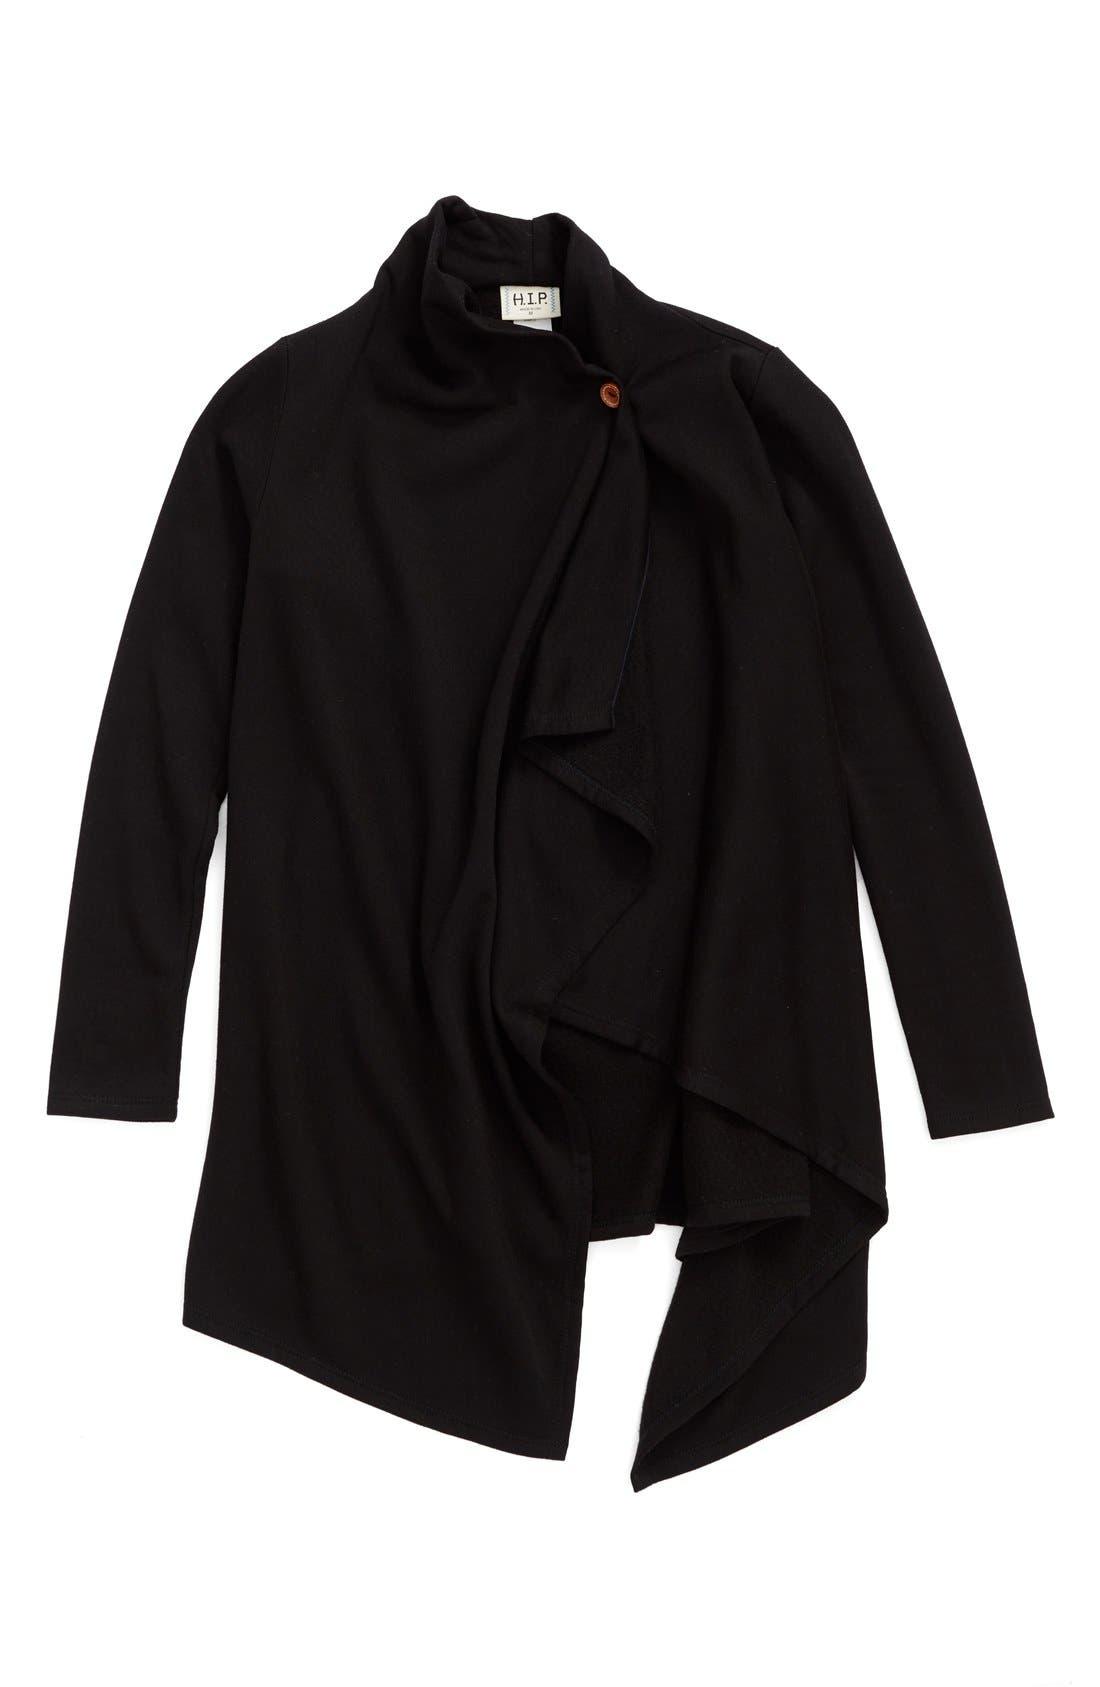 Alternate Image 1 Selected - h.i.p. One-Button Brushed Fleece Wrap Cardigan (Big Girls)